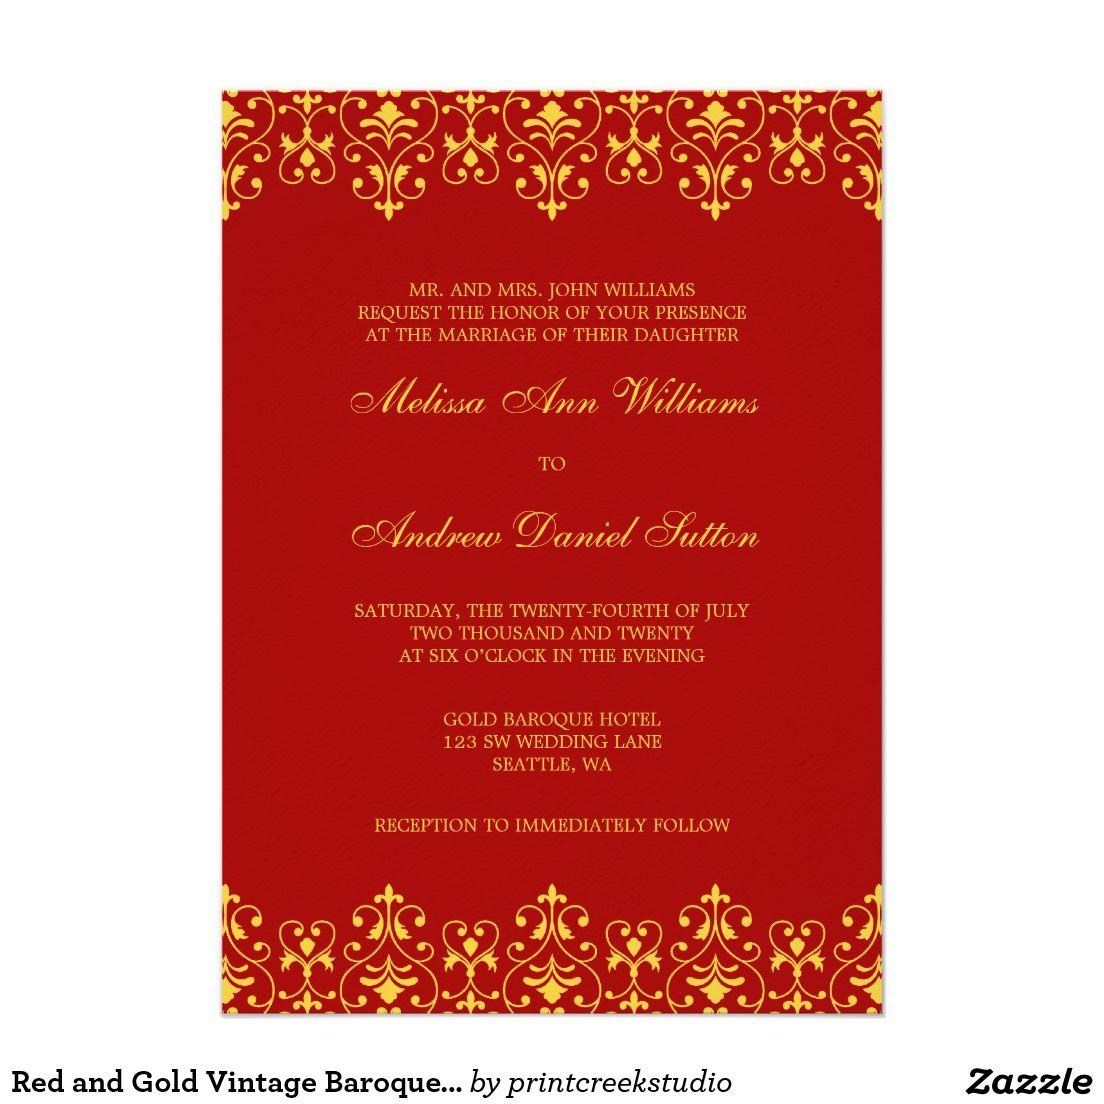 Red and Gold Vintage Baroque Wedding Invitation | Invitations ...